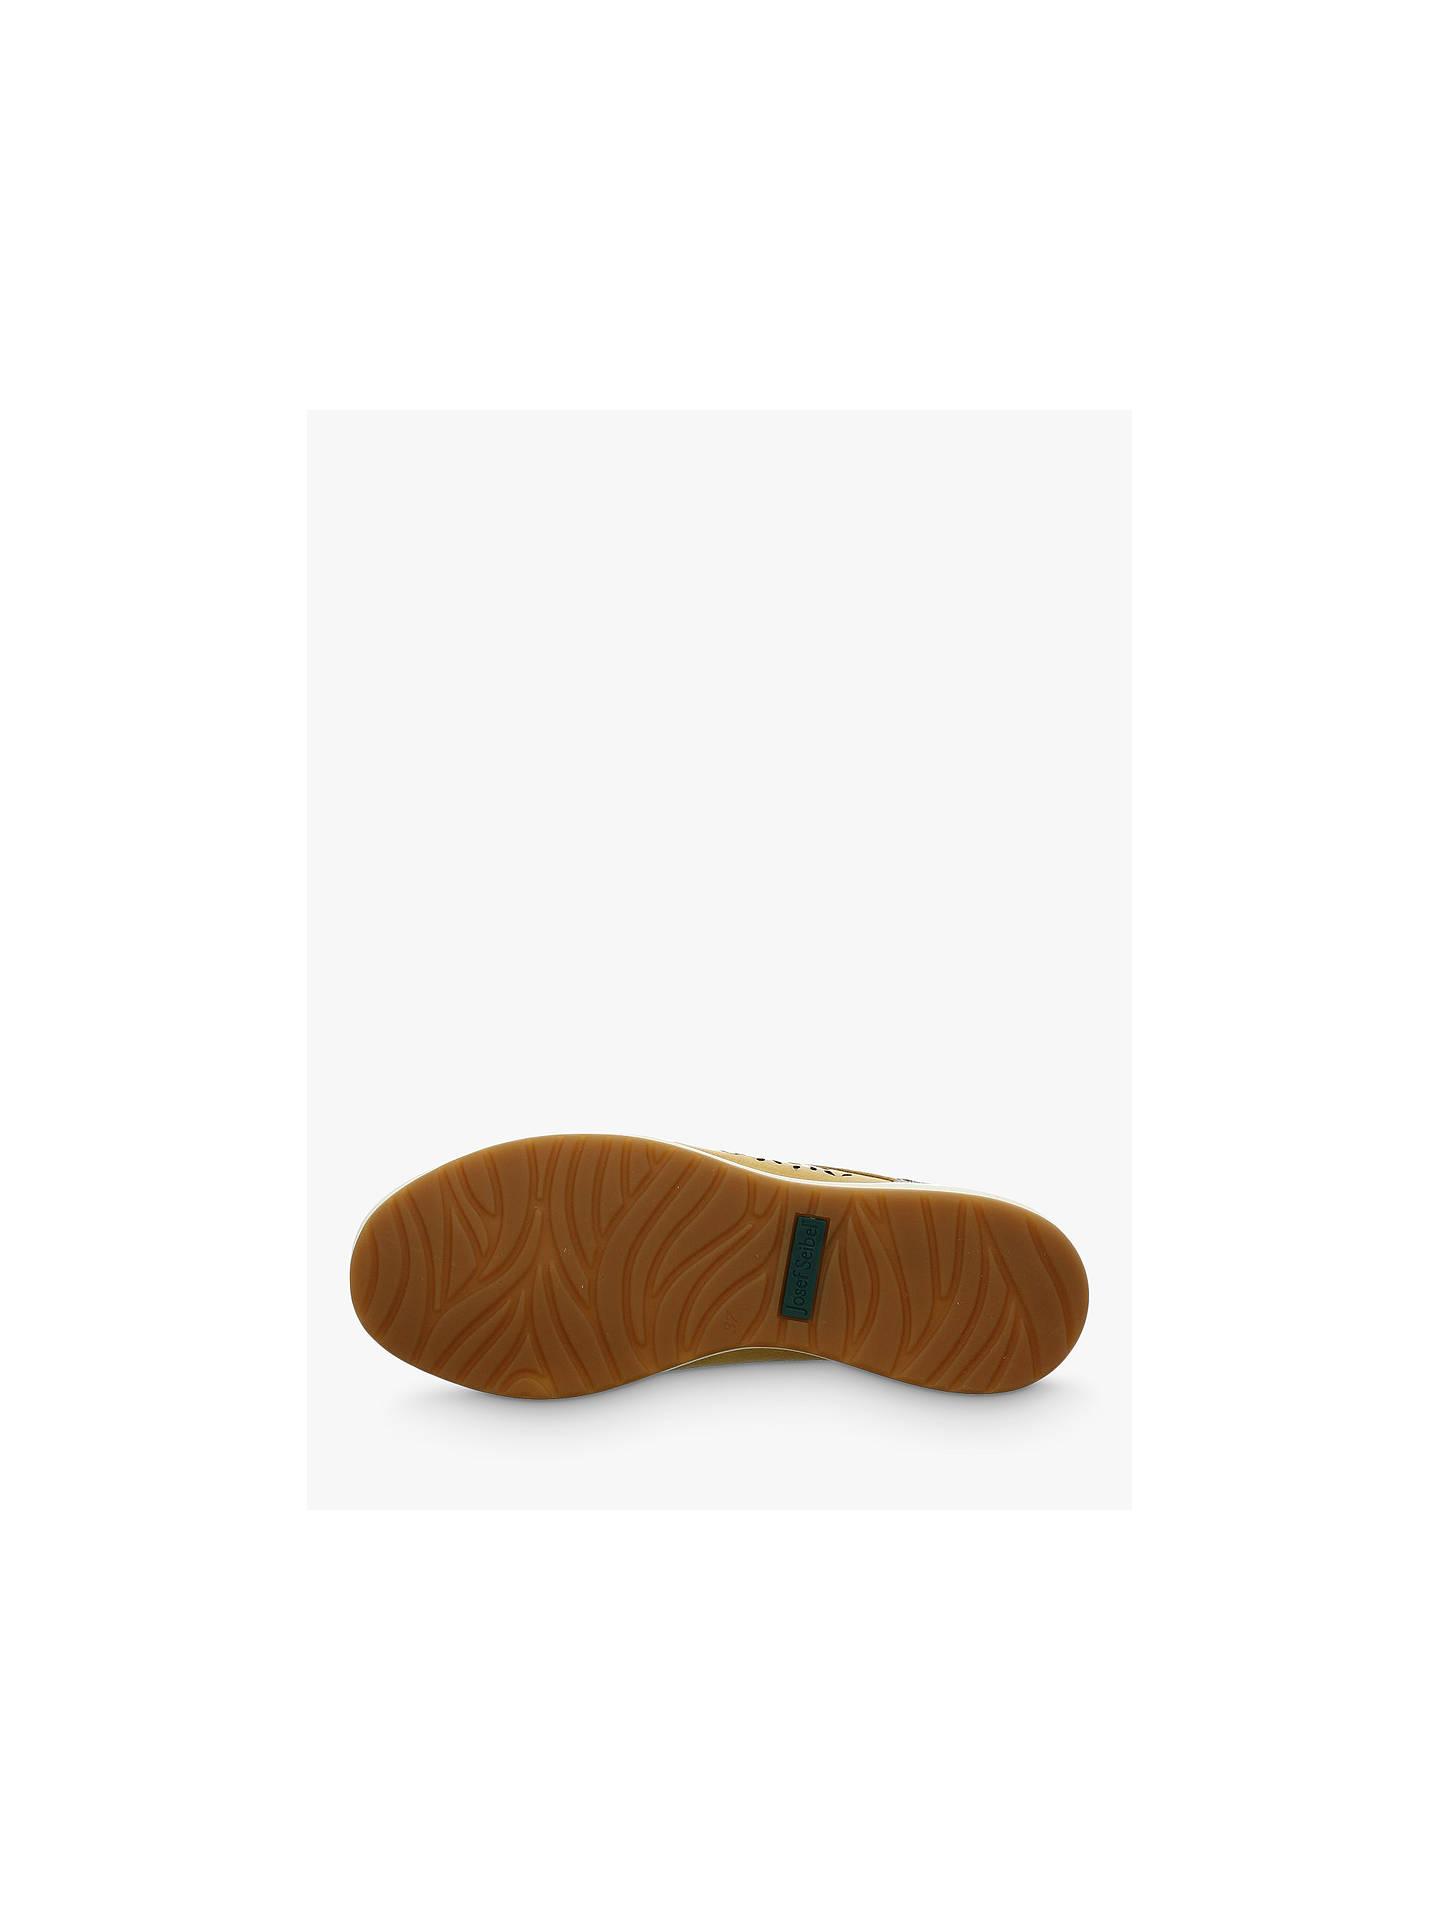 6c0f0e73 ... Buy Josef Seibel Caren 06 Low Top Cut Out Flatform Trainers, Mustard  Leather, 4